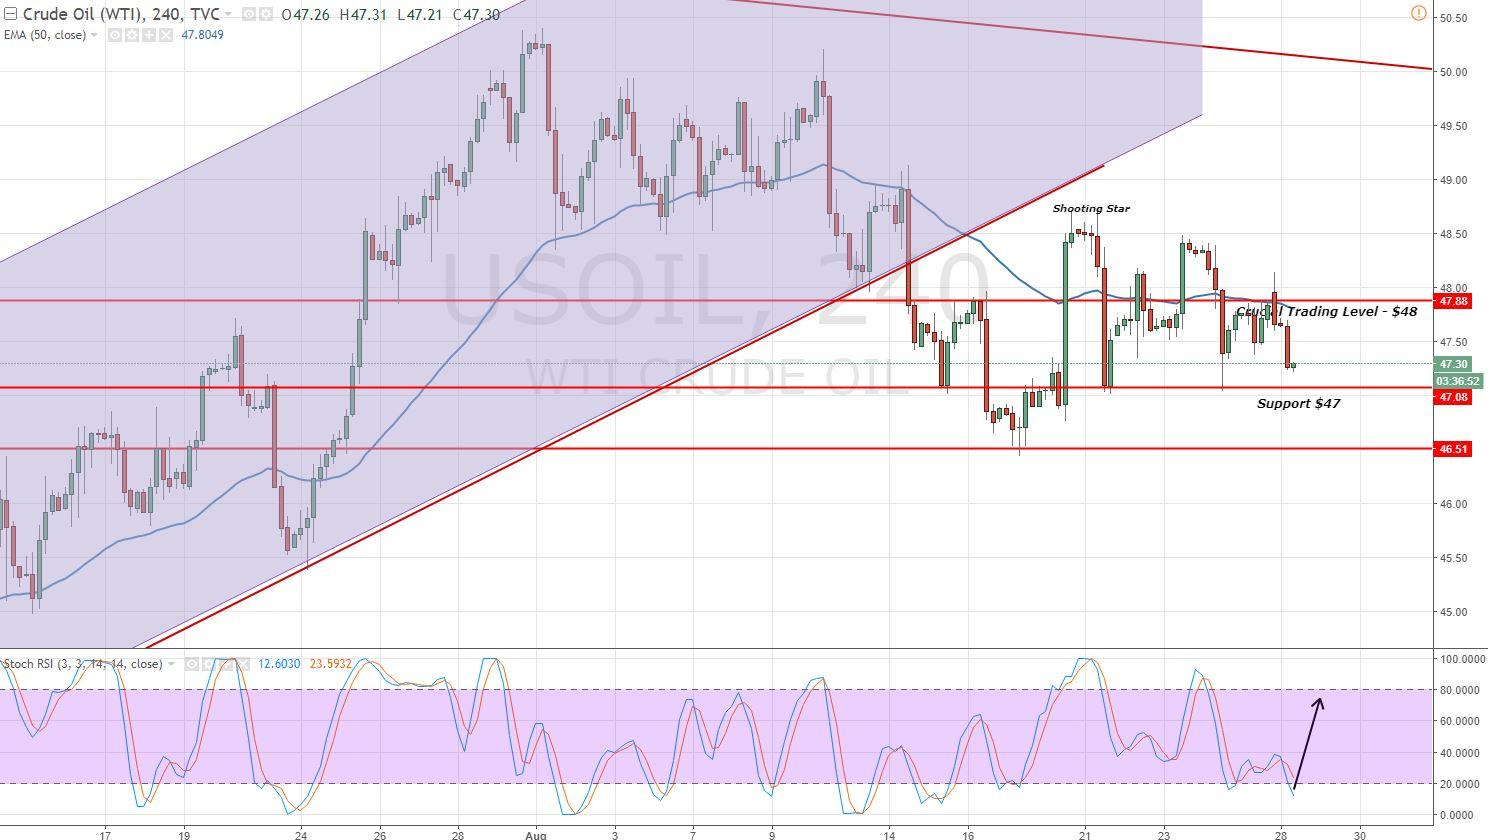 Crude Oil - 2 Hours Chart - Sideways Market